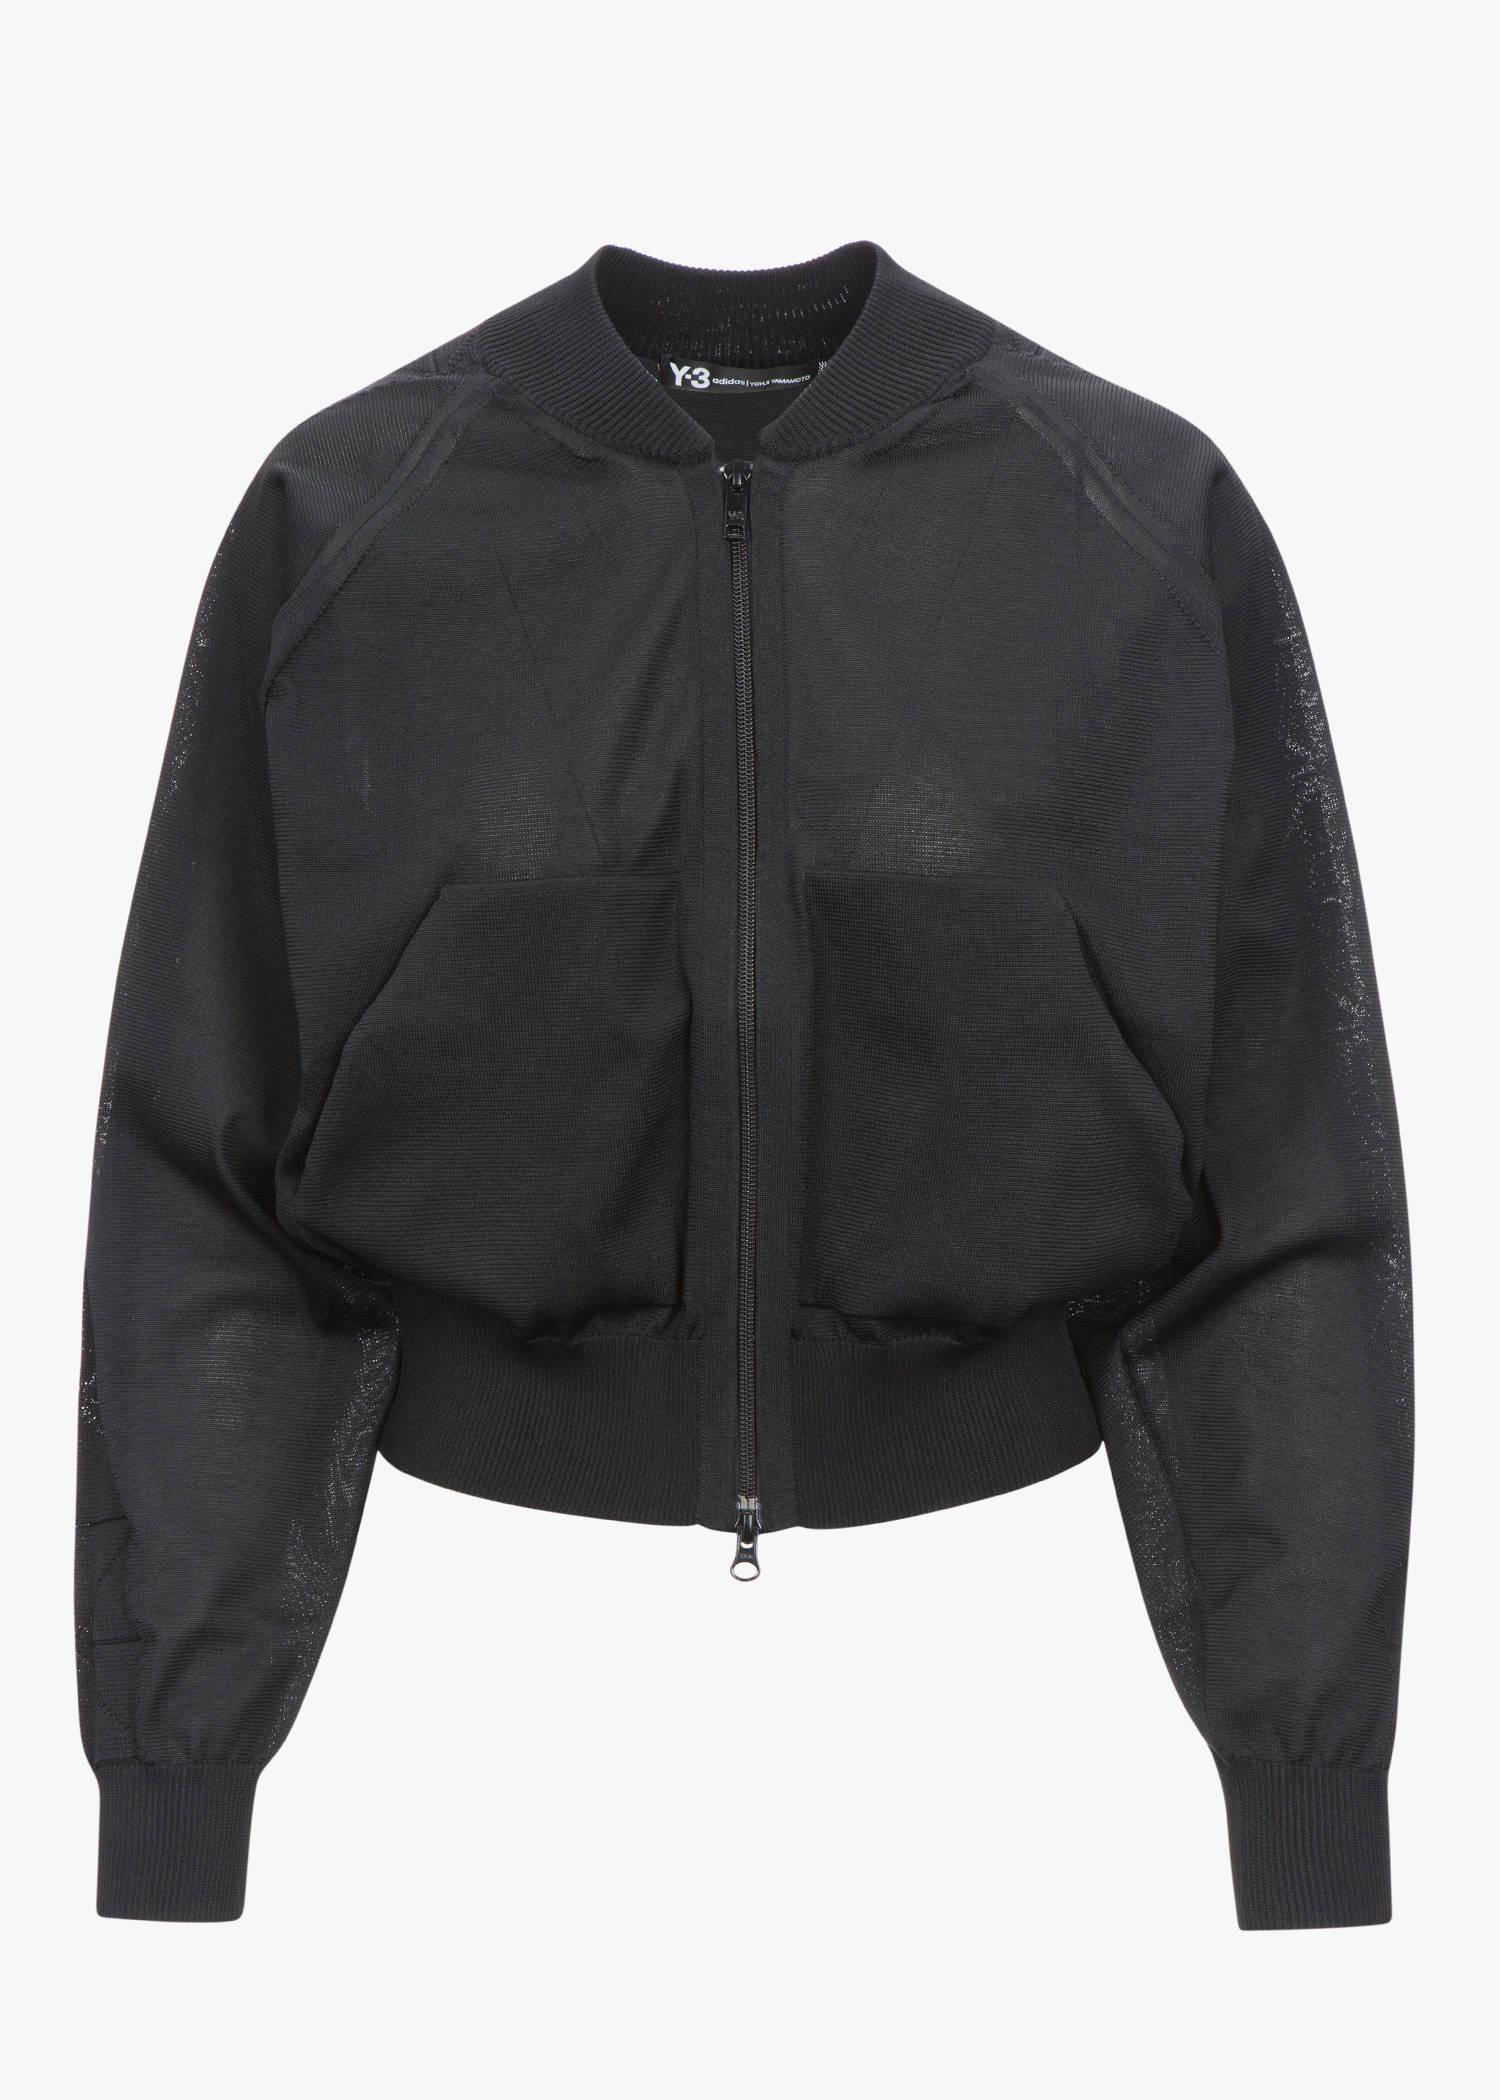 Y-3 Knit Bomber Jacket In Black